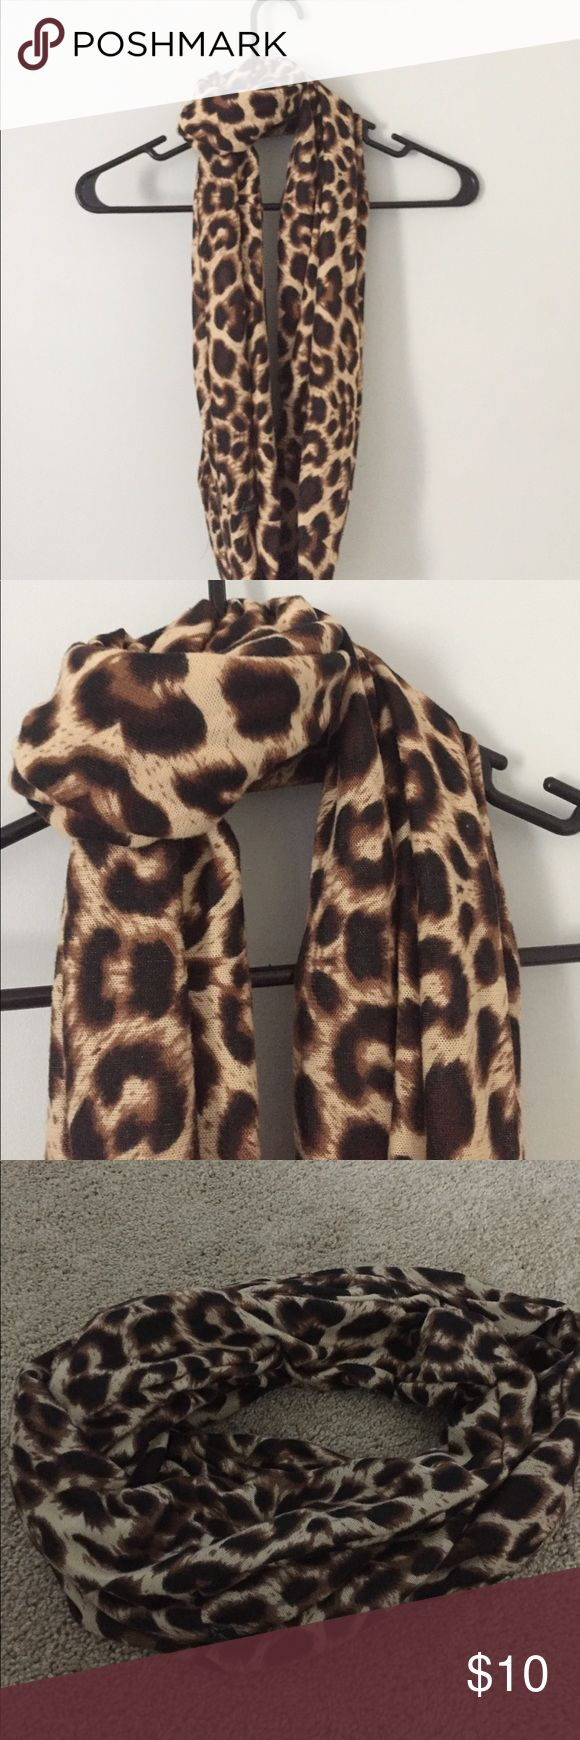 Infinity Cheetah Scarf Infinity Scarf. Cheetah Print. NWOT. Super cute Accessories Scarves & Wraps